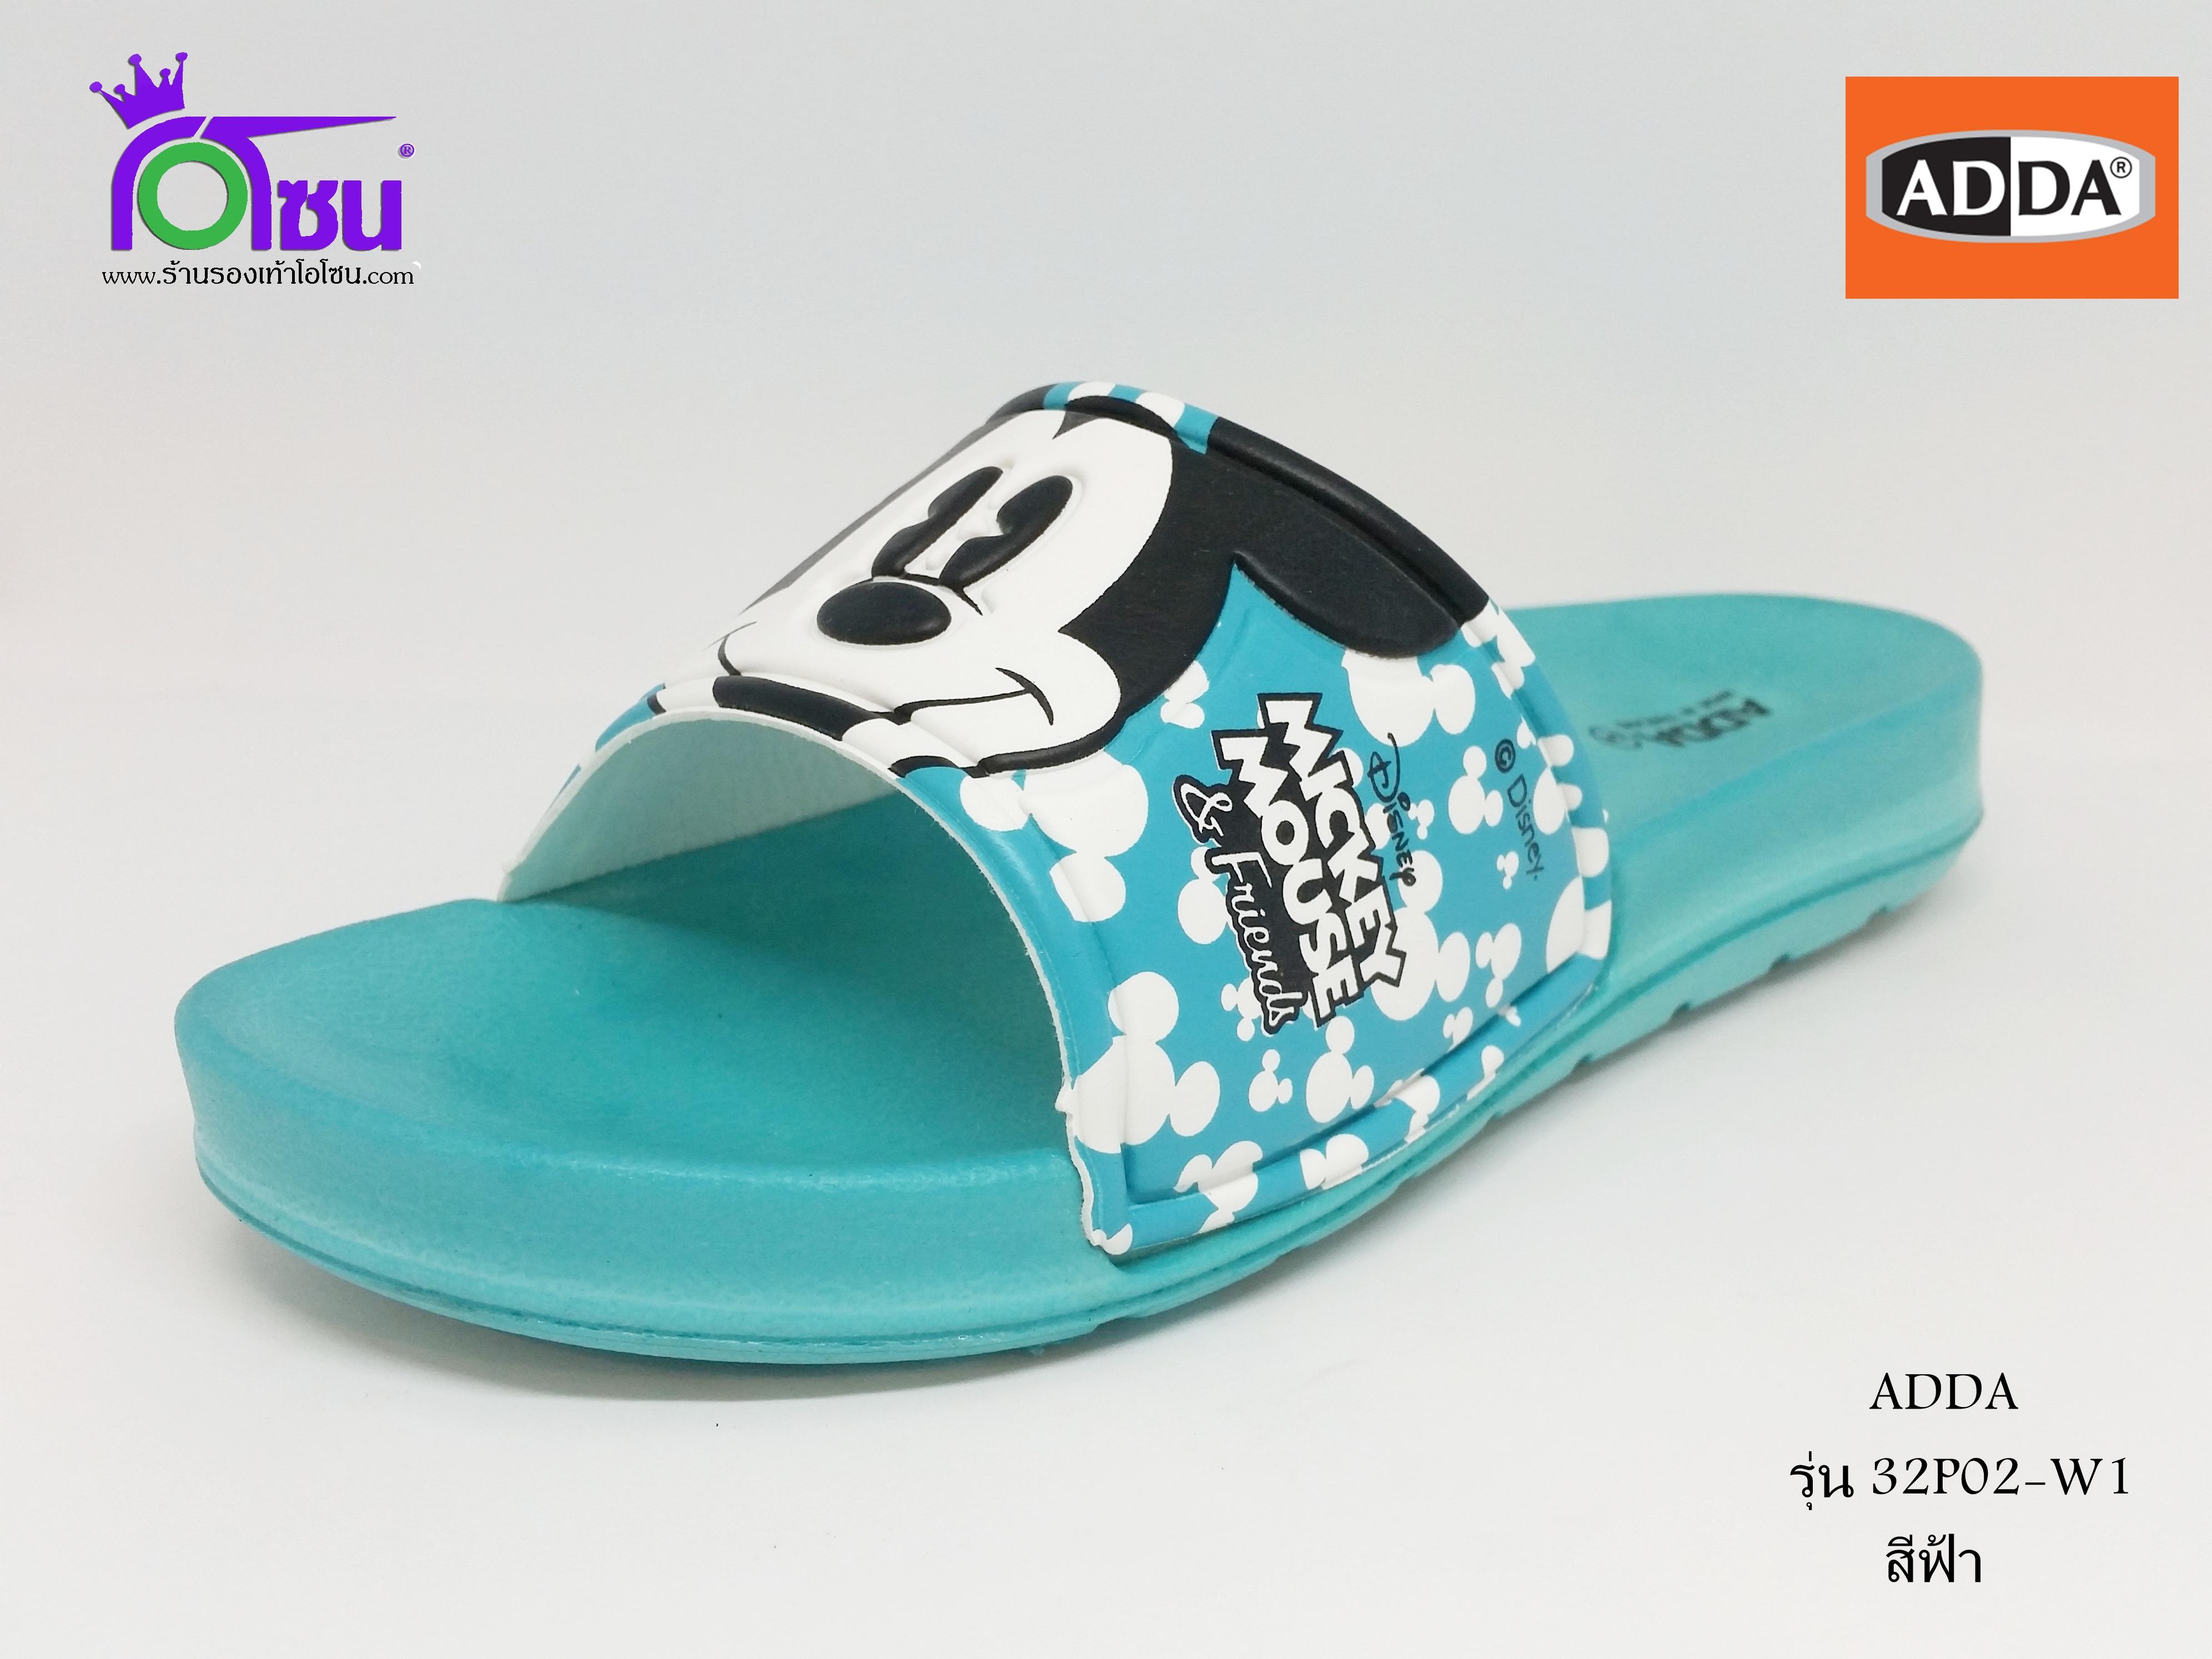 ADDA Mickey Mouse แอ๊ดด้า มิกกี้เมาส์ รหัส 32P02-W1 สีฟ้า เบอร์ 4-6